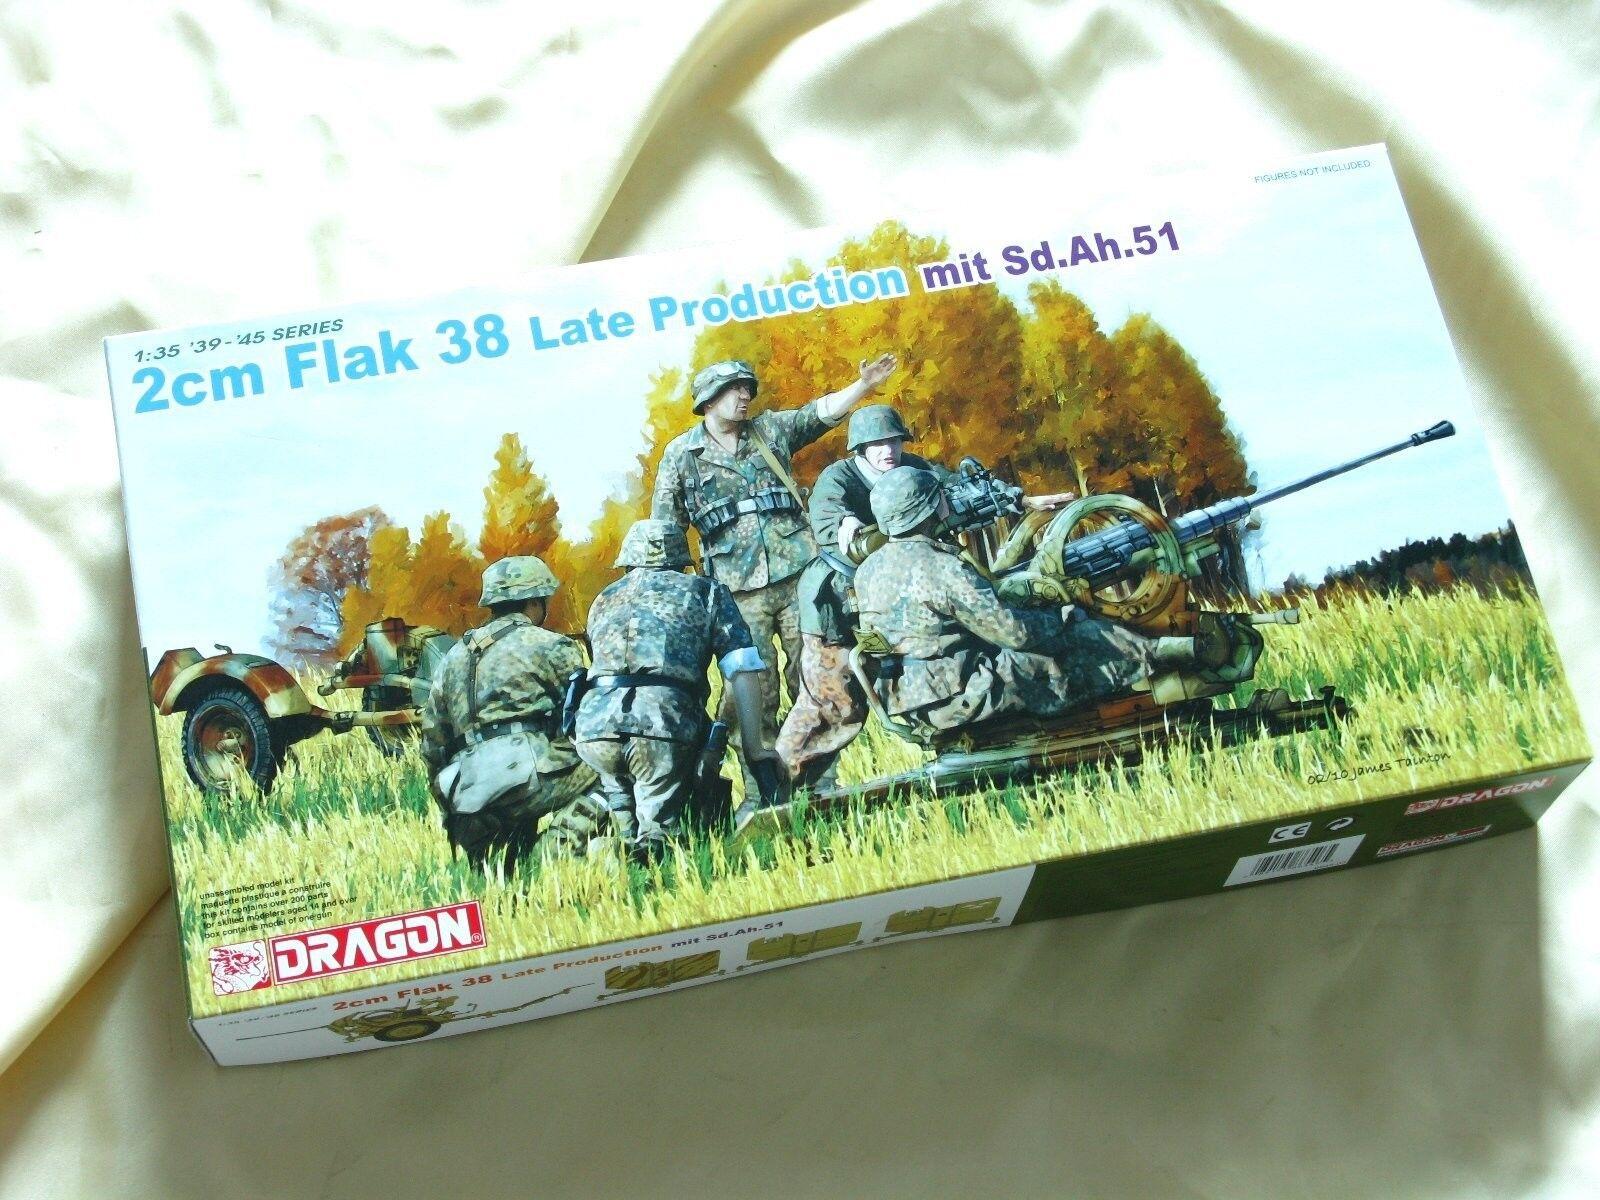 Dragon 6546 1 35 2cm Flak 38 Late Production mit Sd.Ah.51